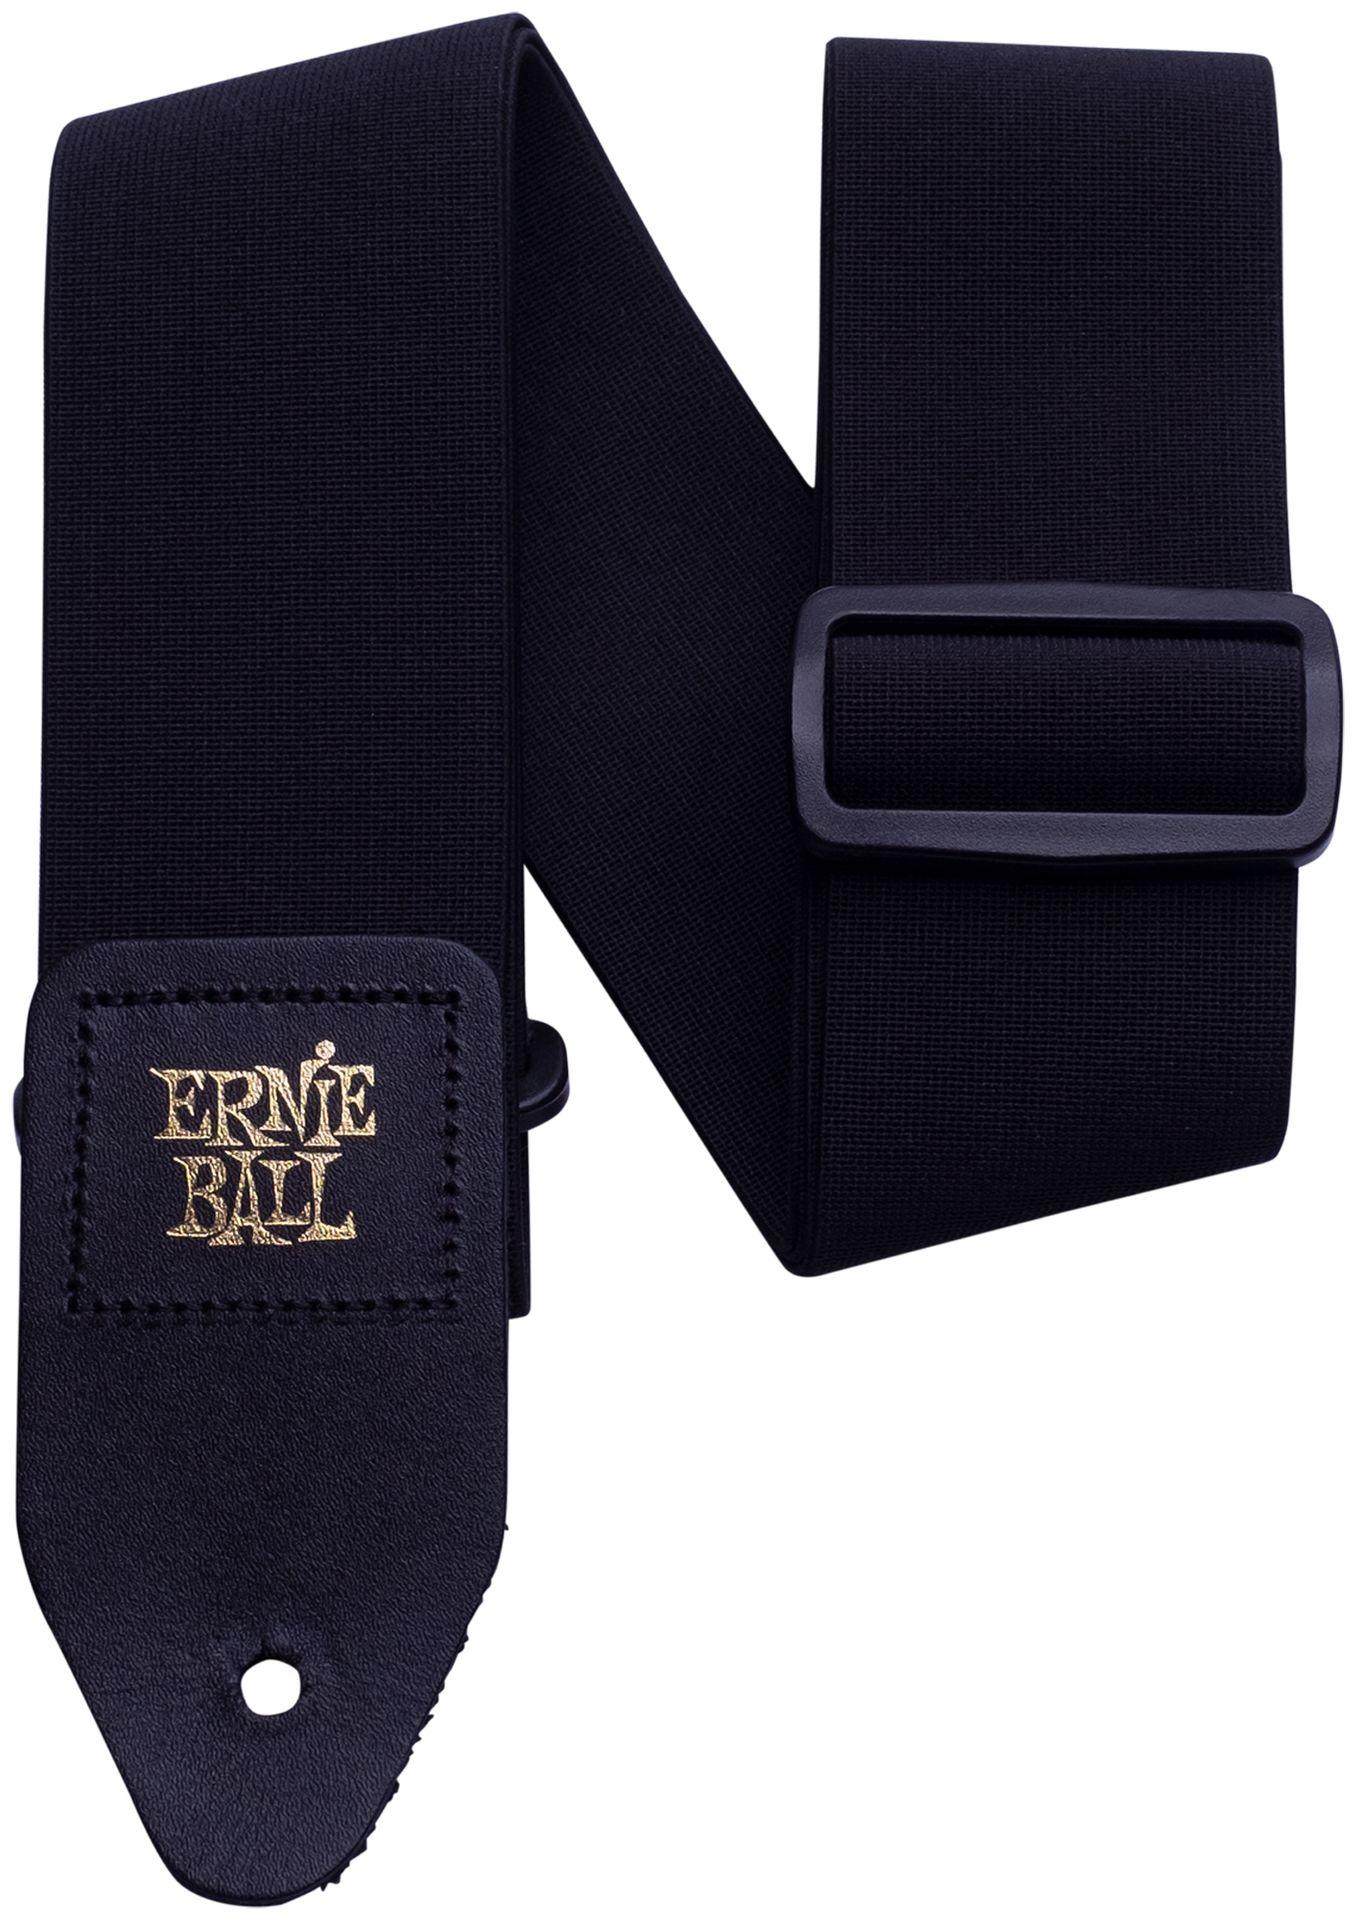 Ernie Ball EB4143 Stretch Comfort Gitarrengurt Black